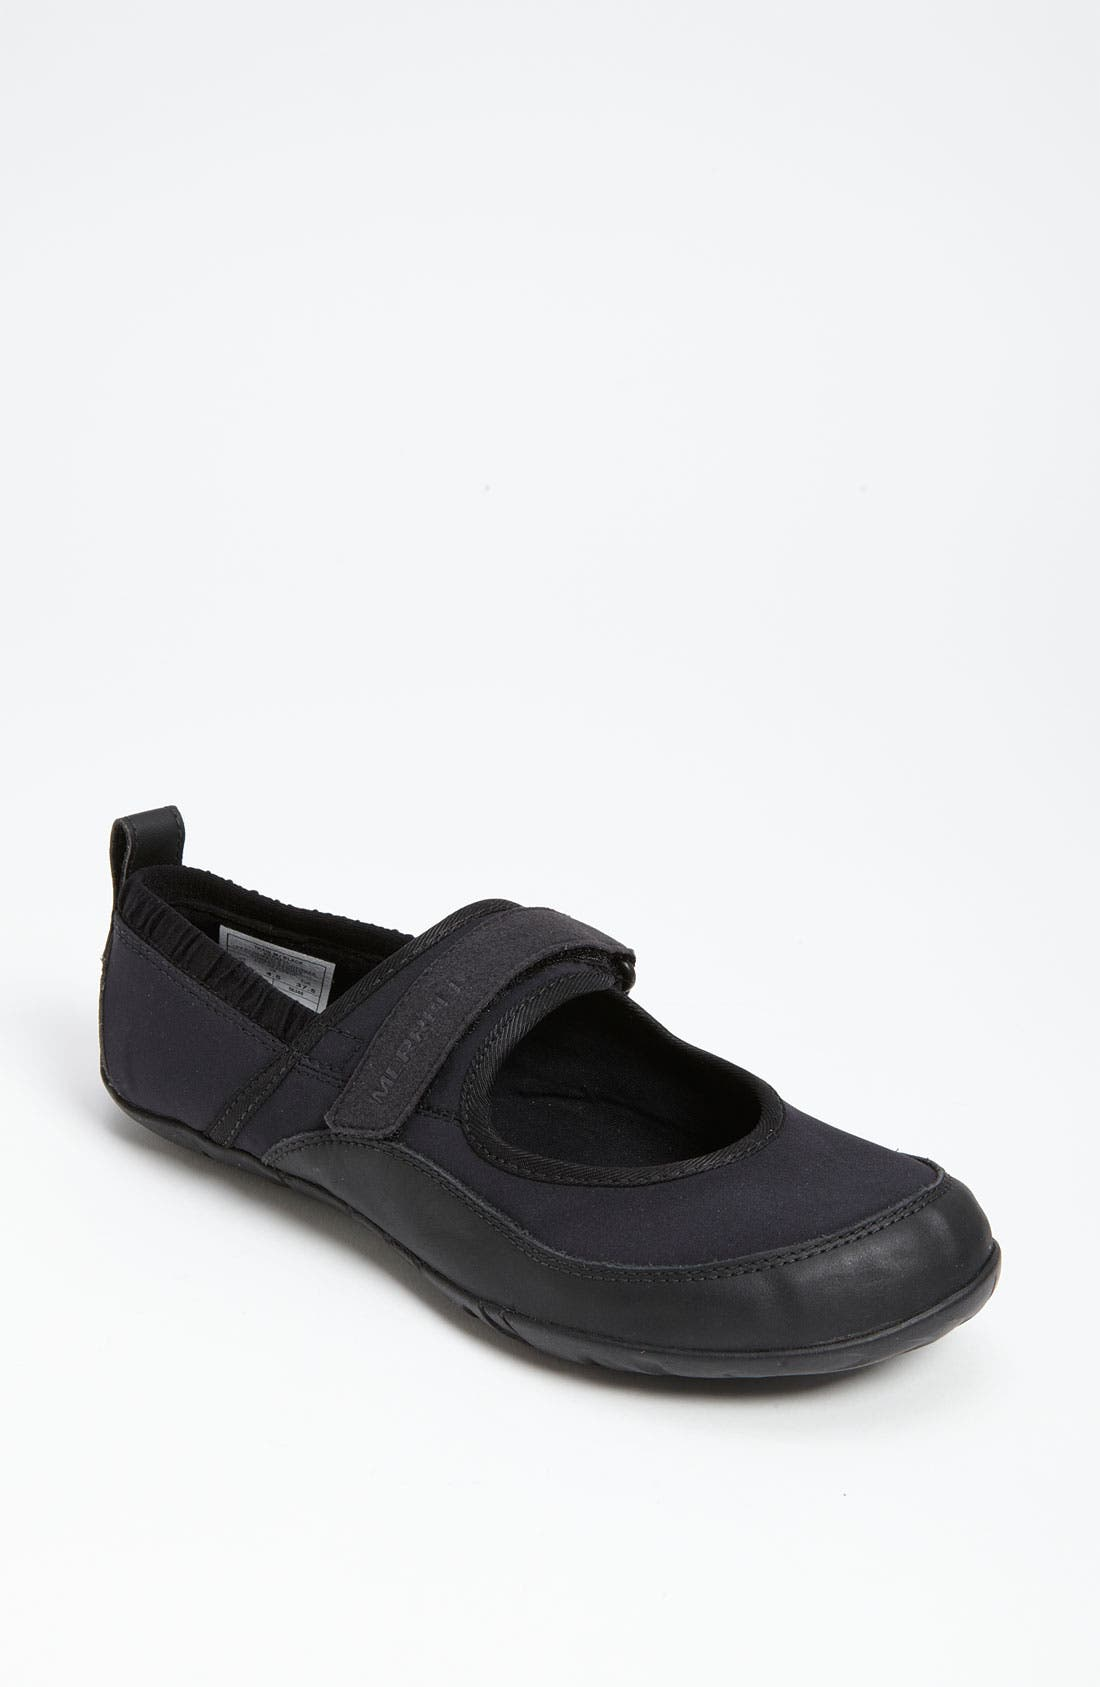 Main Image - Merrell 'Stretch Glove' Training Shoe